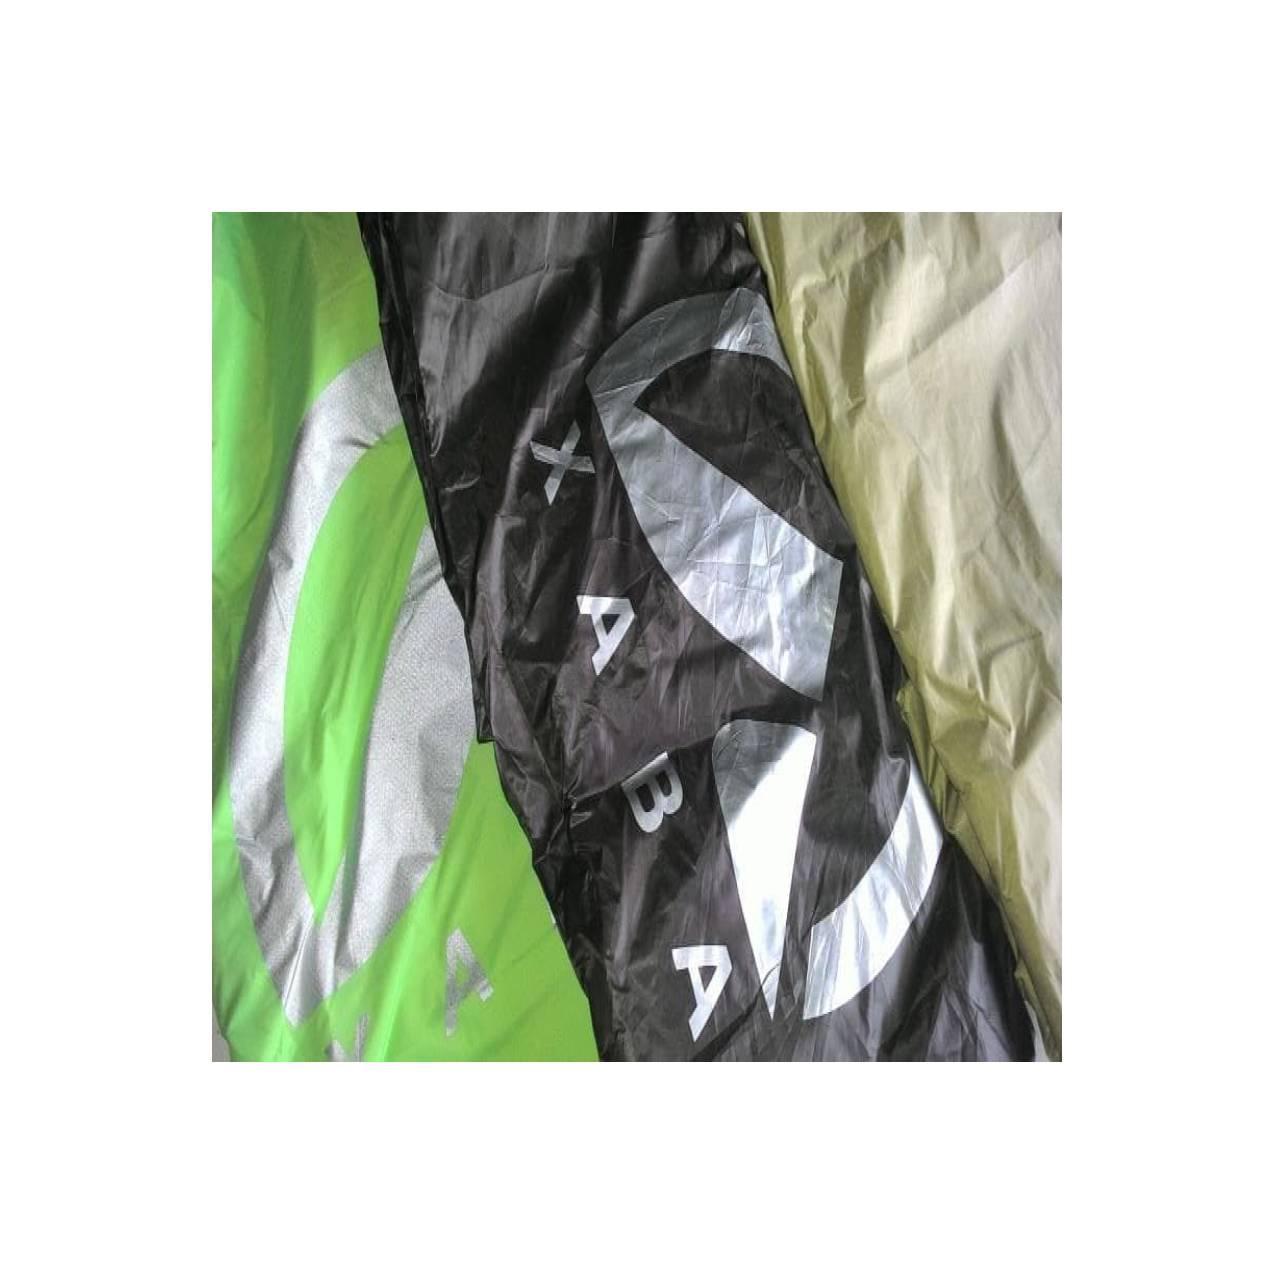 Beli Tenda 2x3 Store Marwanto606 Flysheet M Ultralight For Footprint